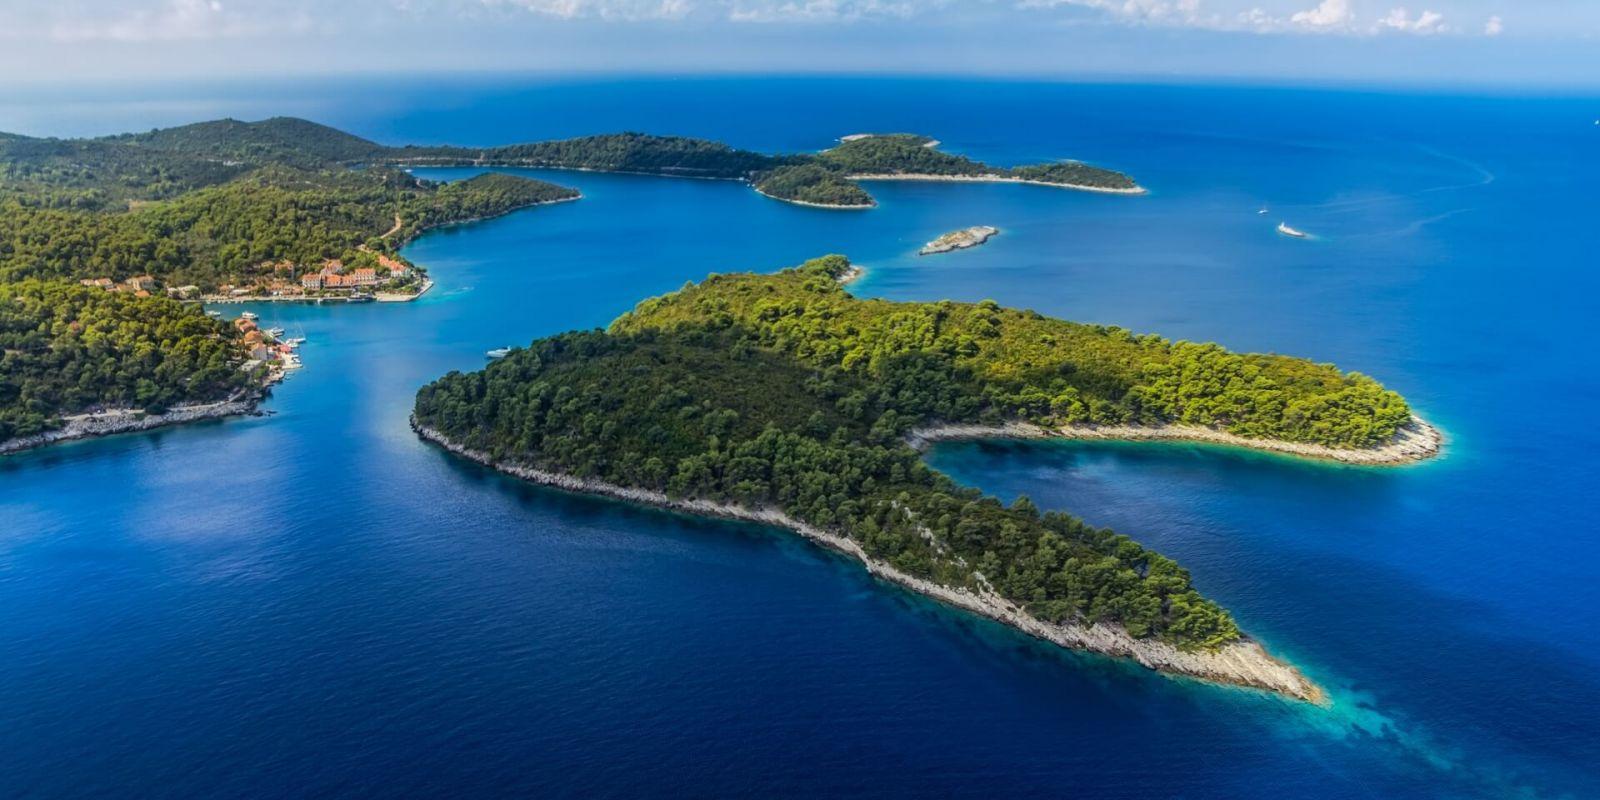 https://www.talamare.com/medias/View of Mljet National Park near Dubrovnik during a Croatia yacht charter